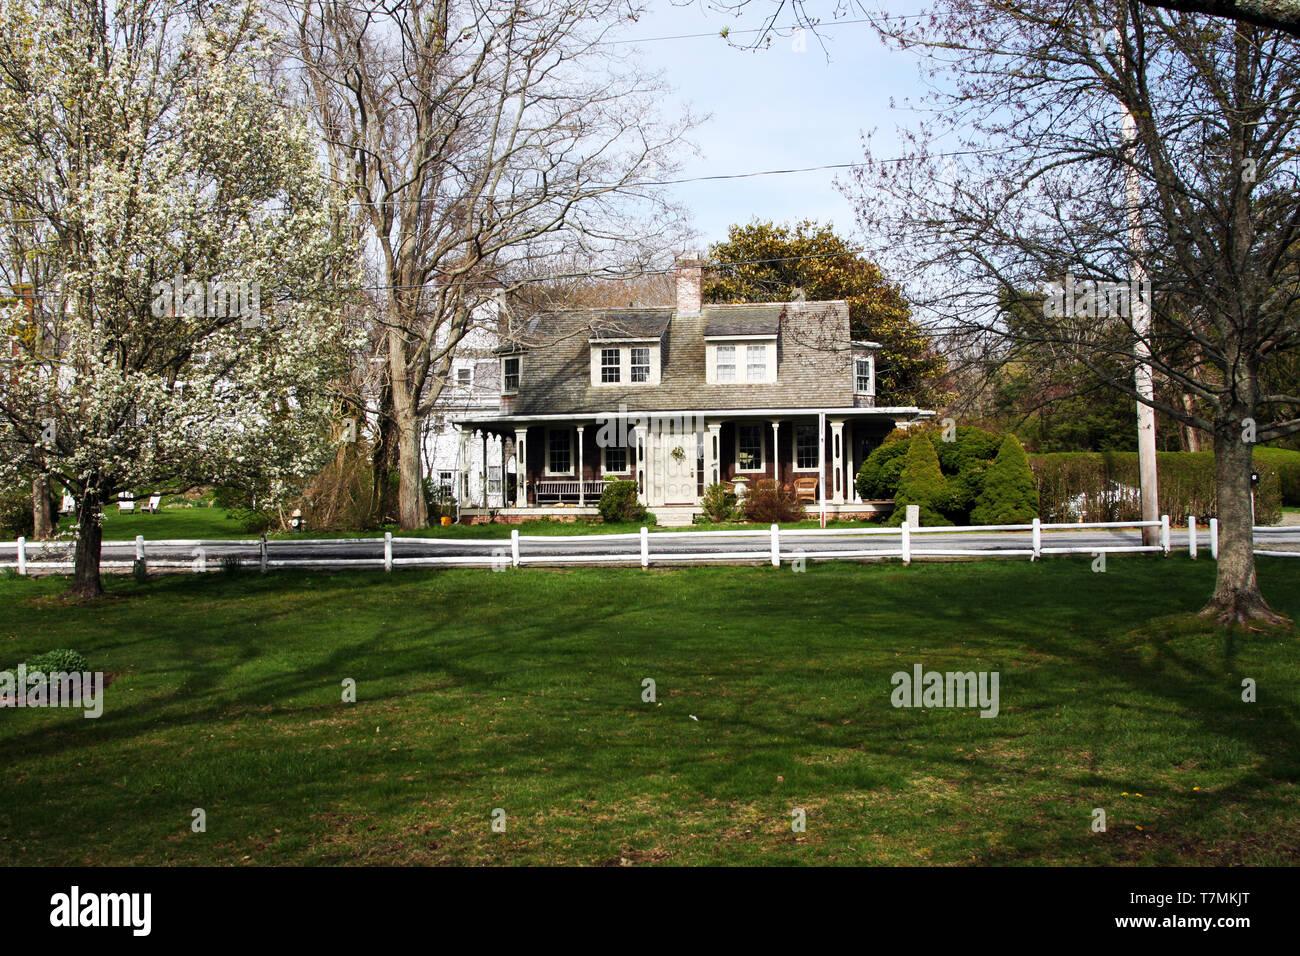 USA, Massachusetts, Cape Cod, New England, Photo Stock